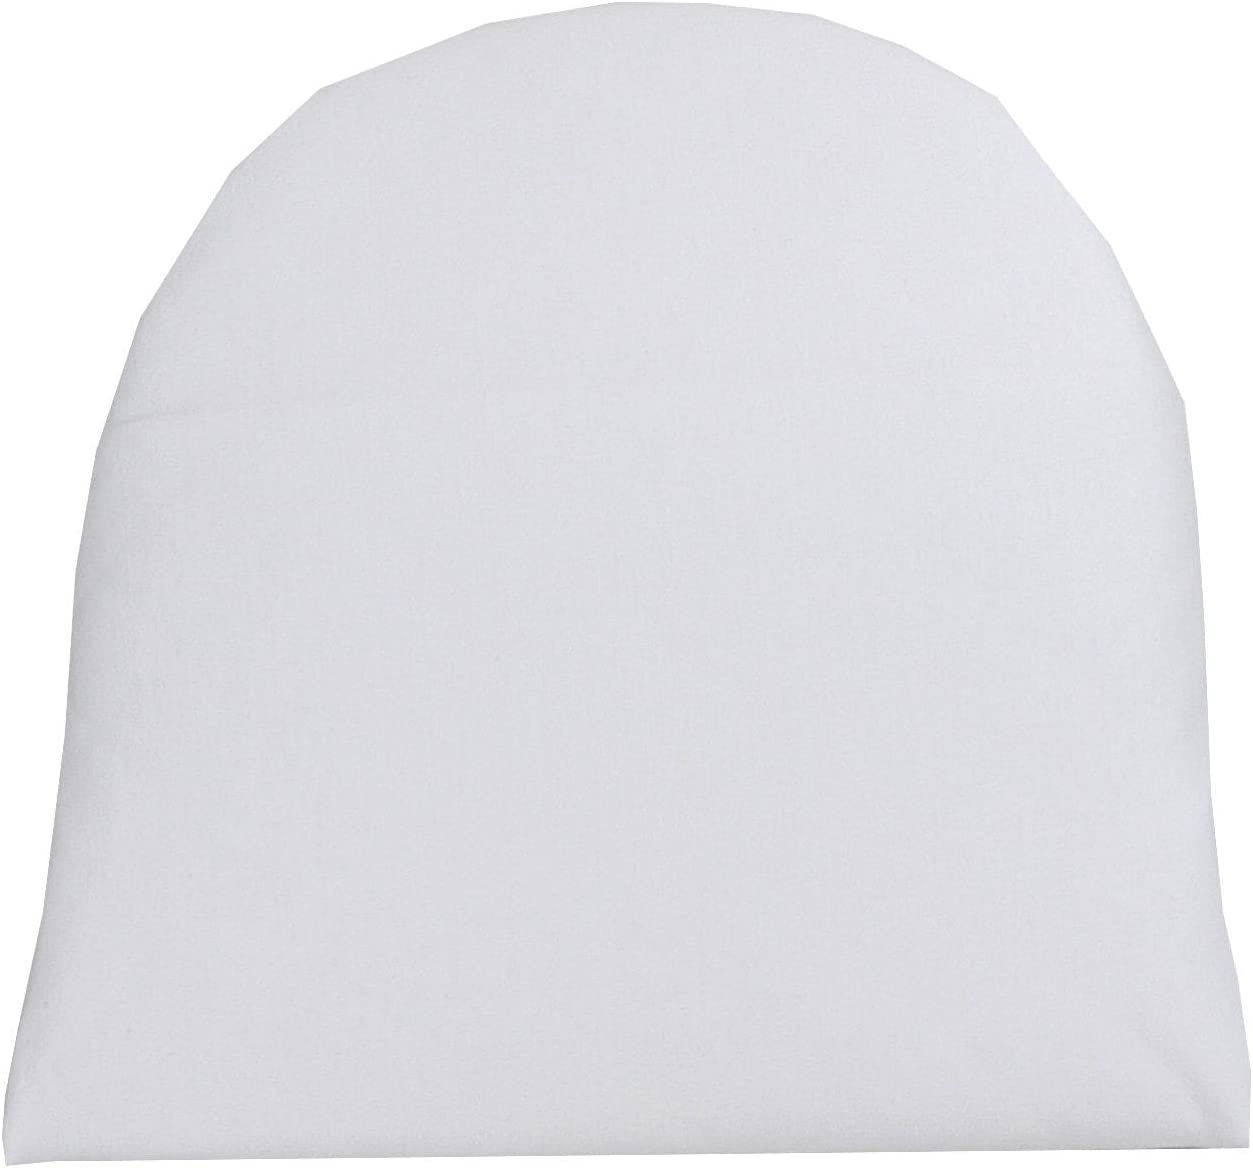 BabyPrem Baby Anti-reflux Pram Moses Wedge Pillow /& Pillowcase 11 x 12 WHITE